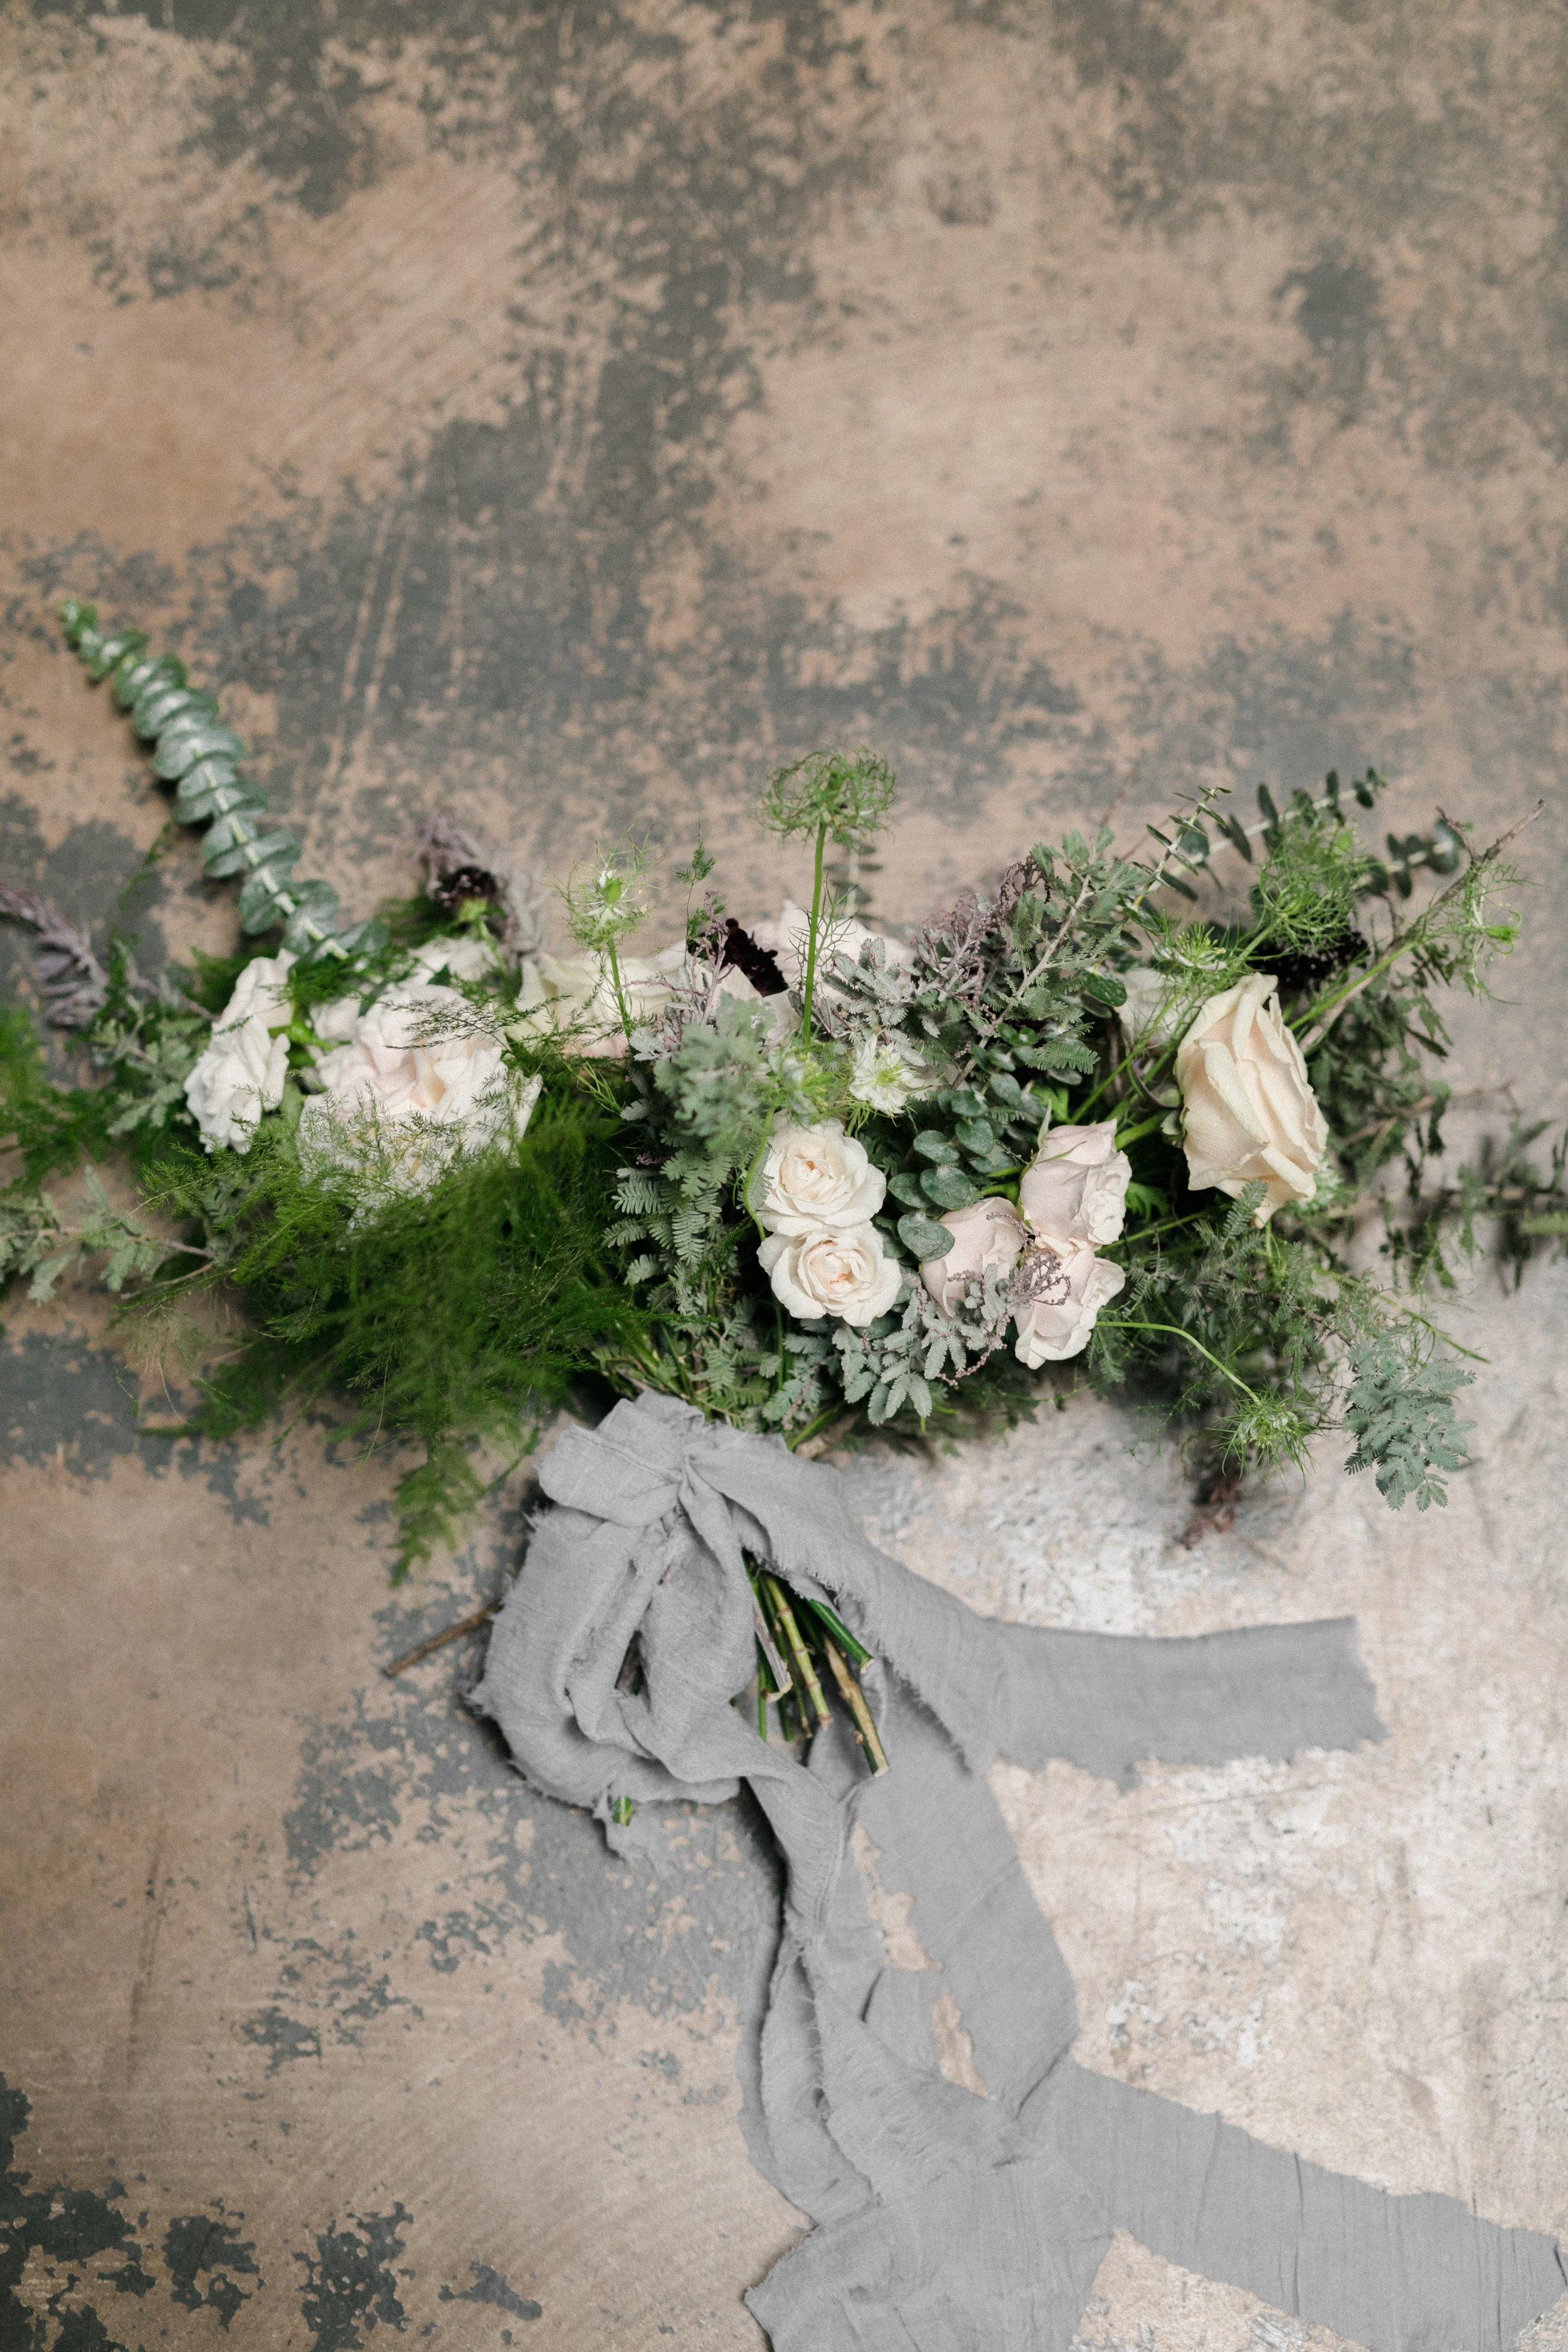 Wispy Bones Skeleton Fine Art Halloween Wedding Editorial in Dallas, Texas